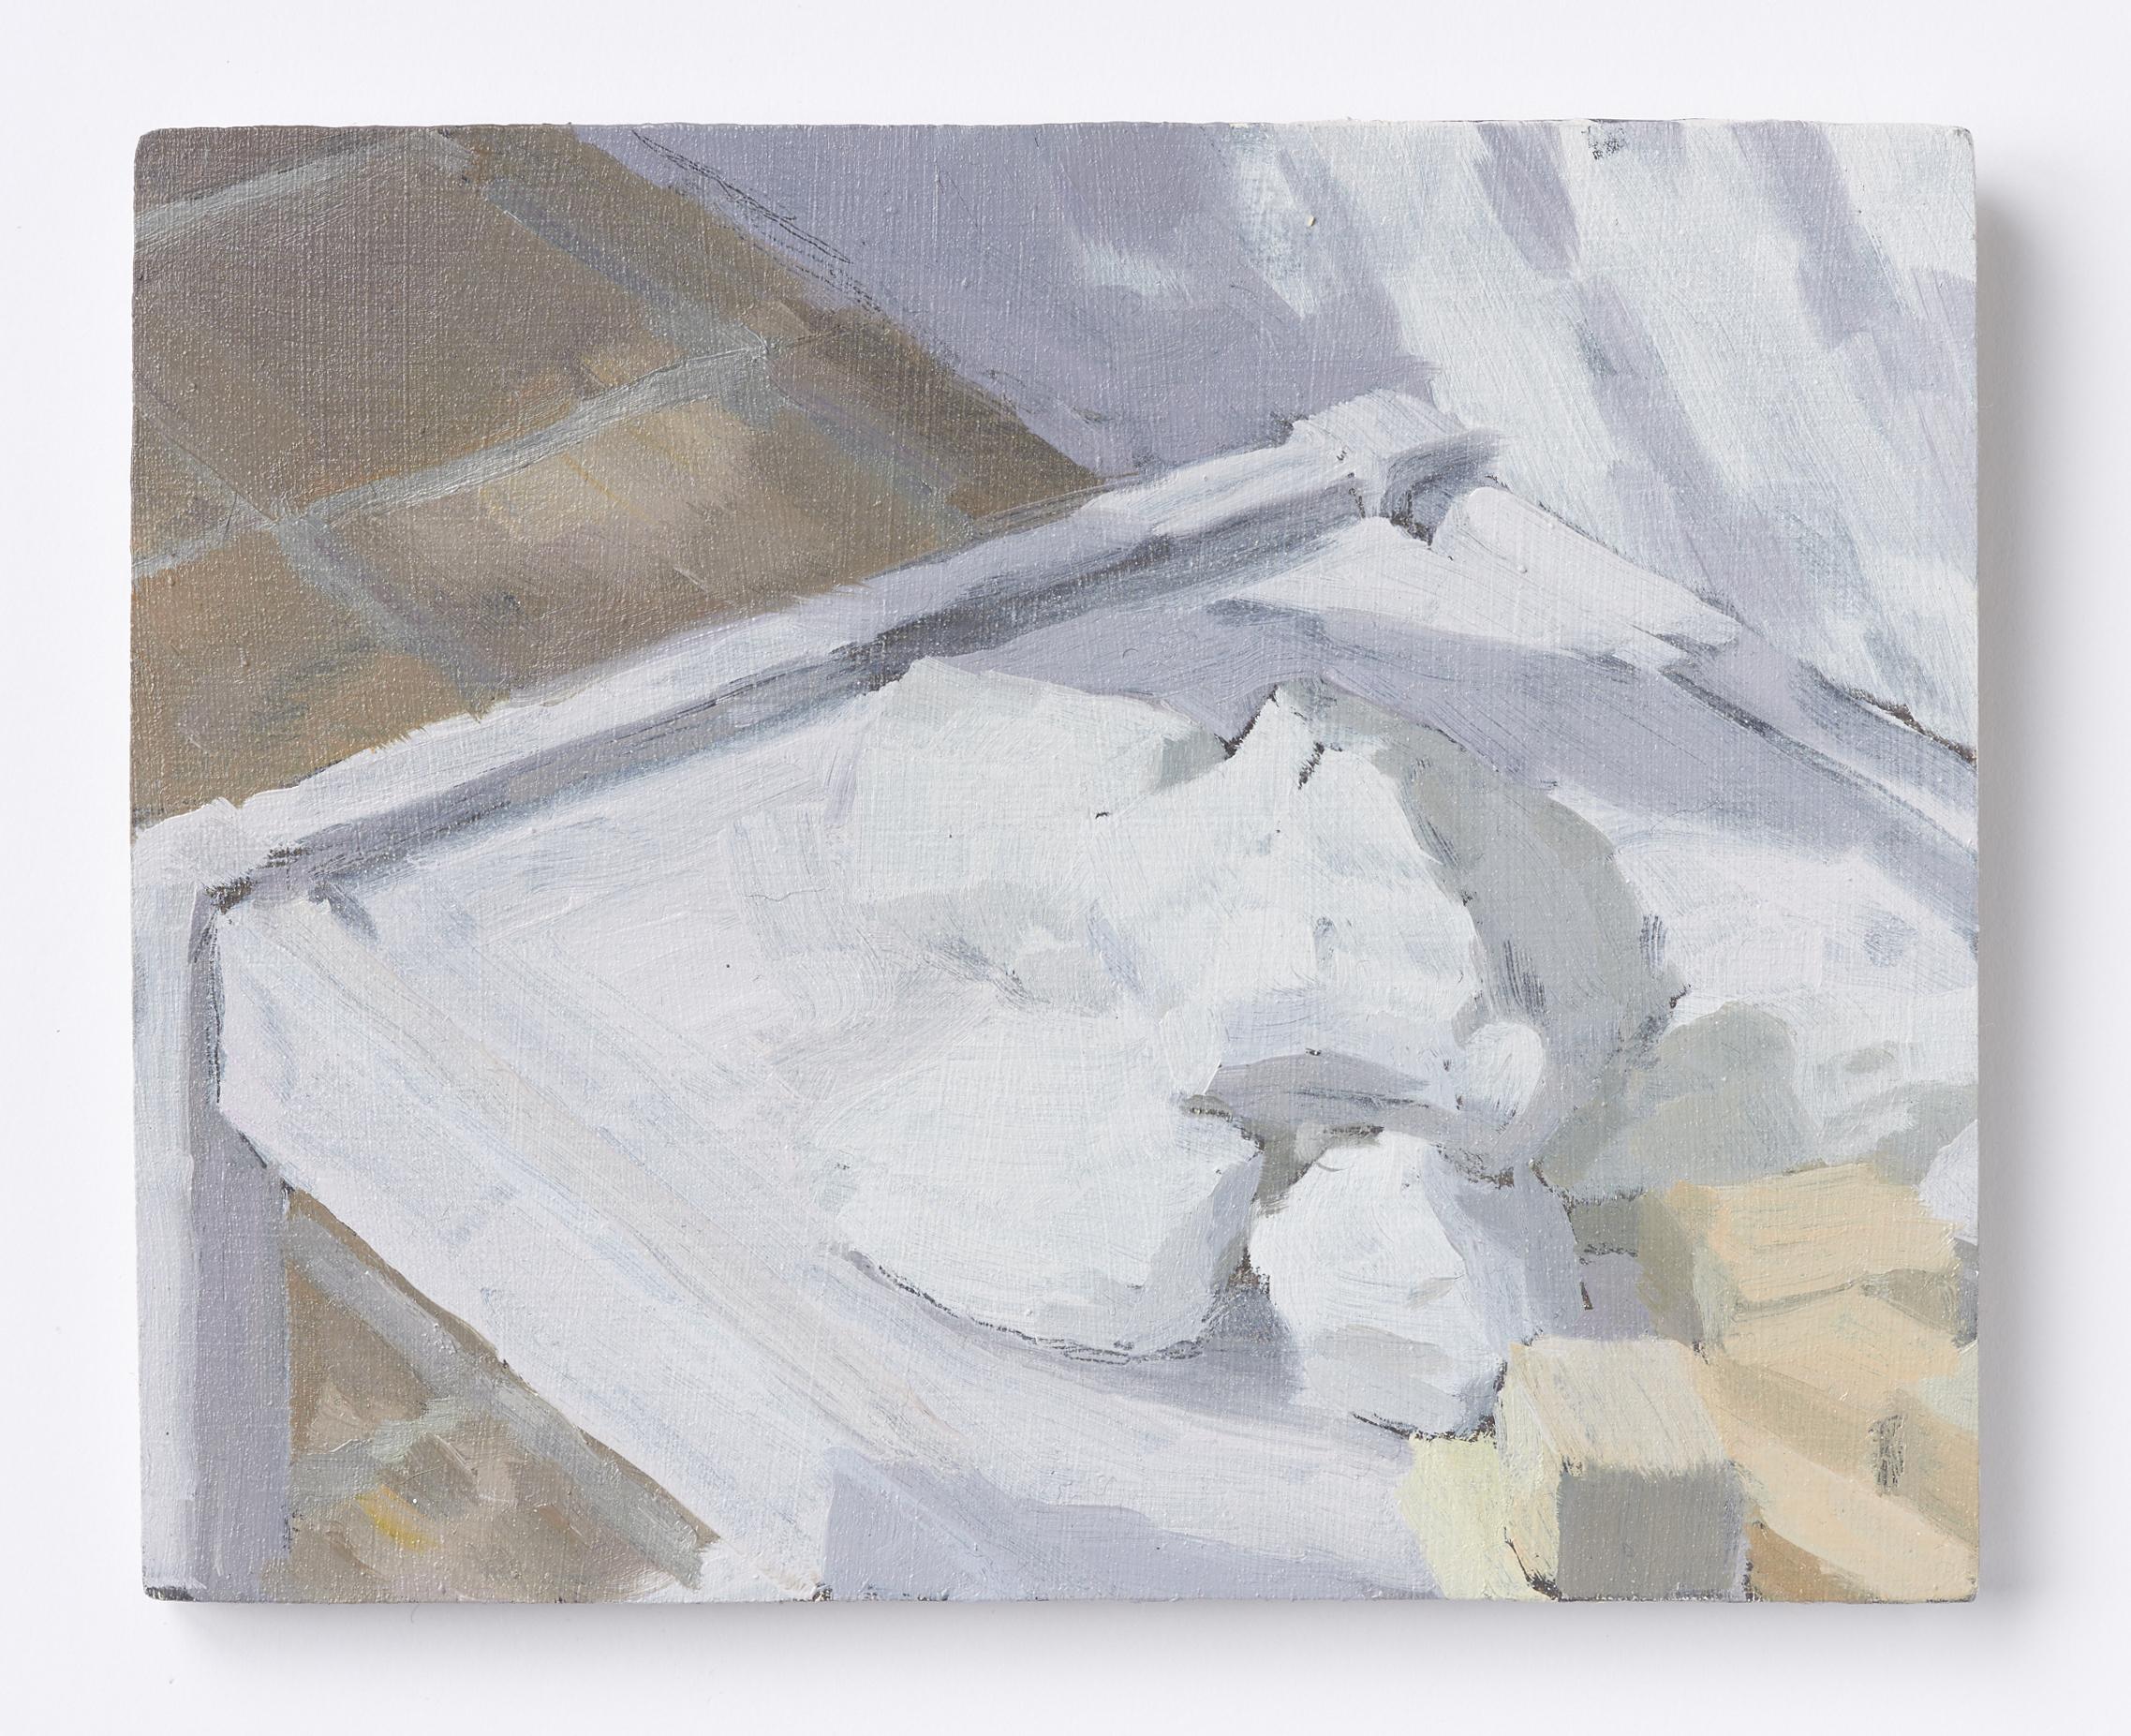 I rommet X, 2018, Oil on plywood, 20 x 15 cm